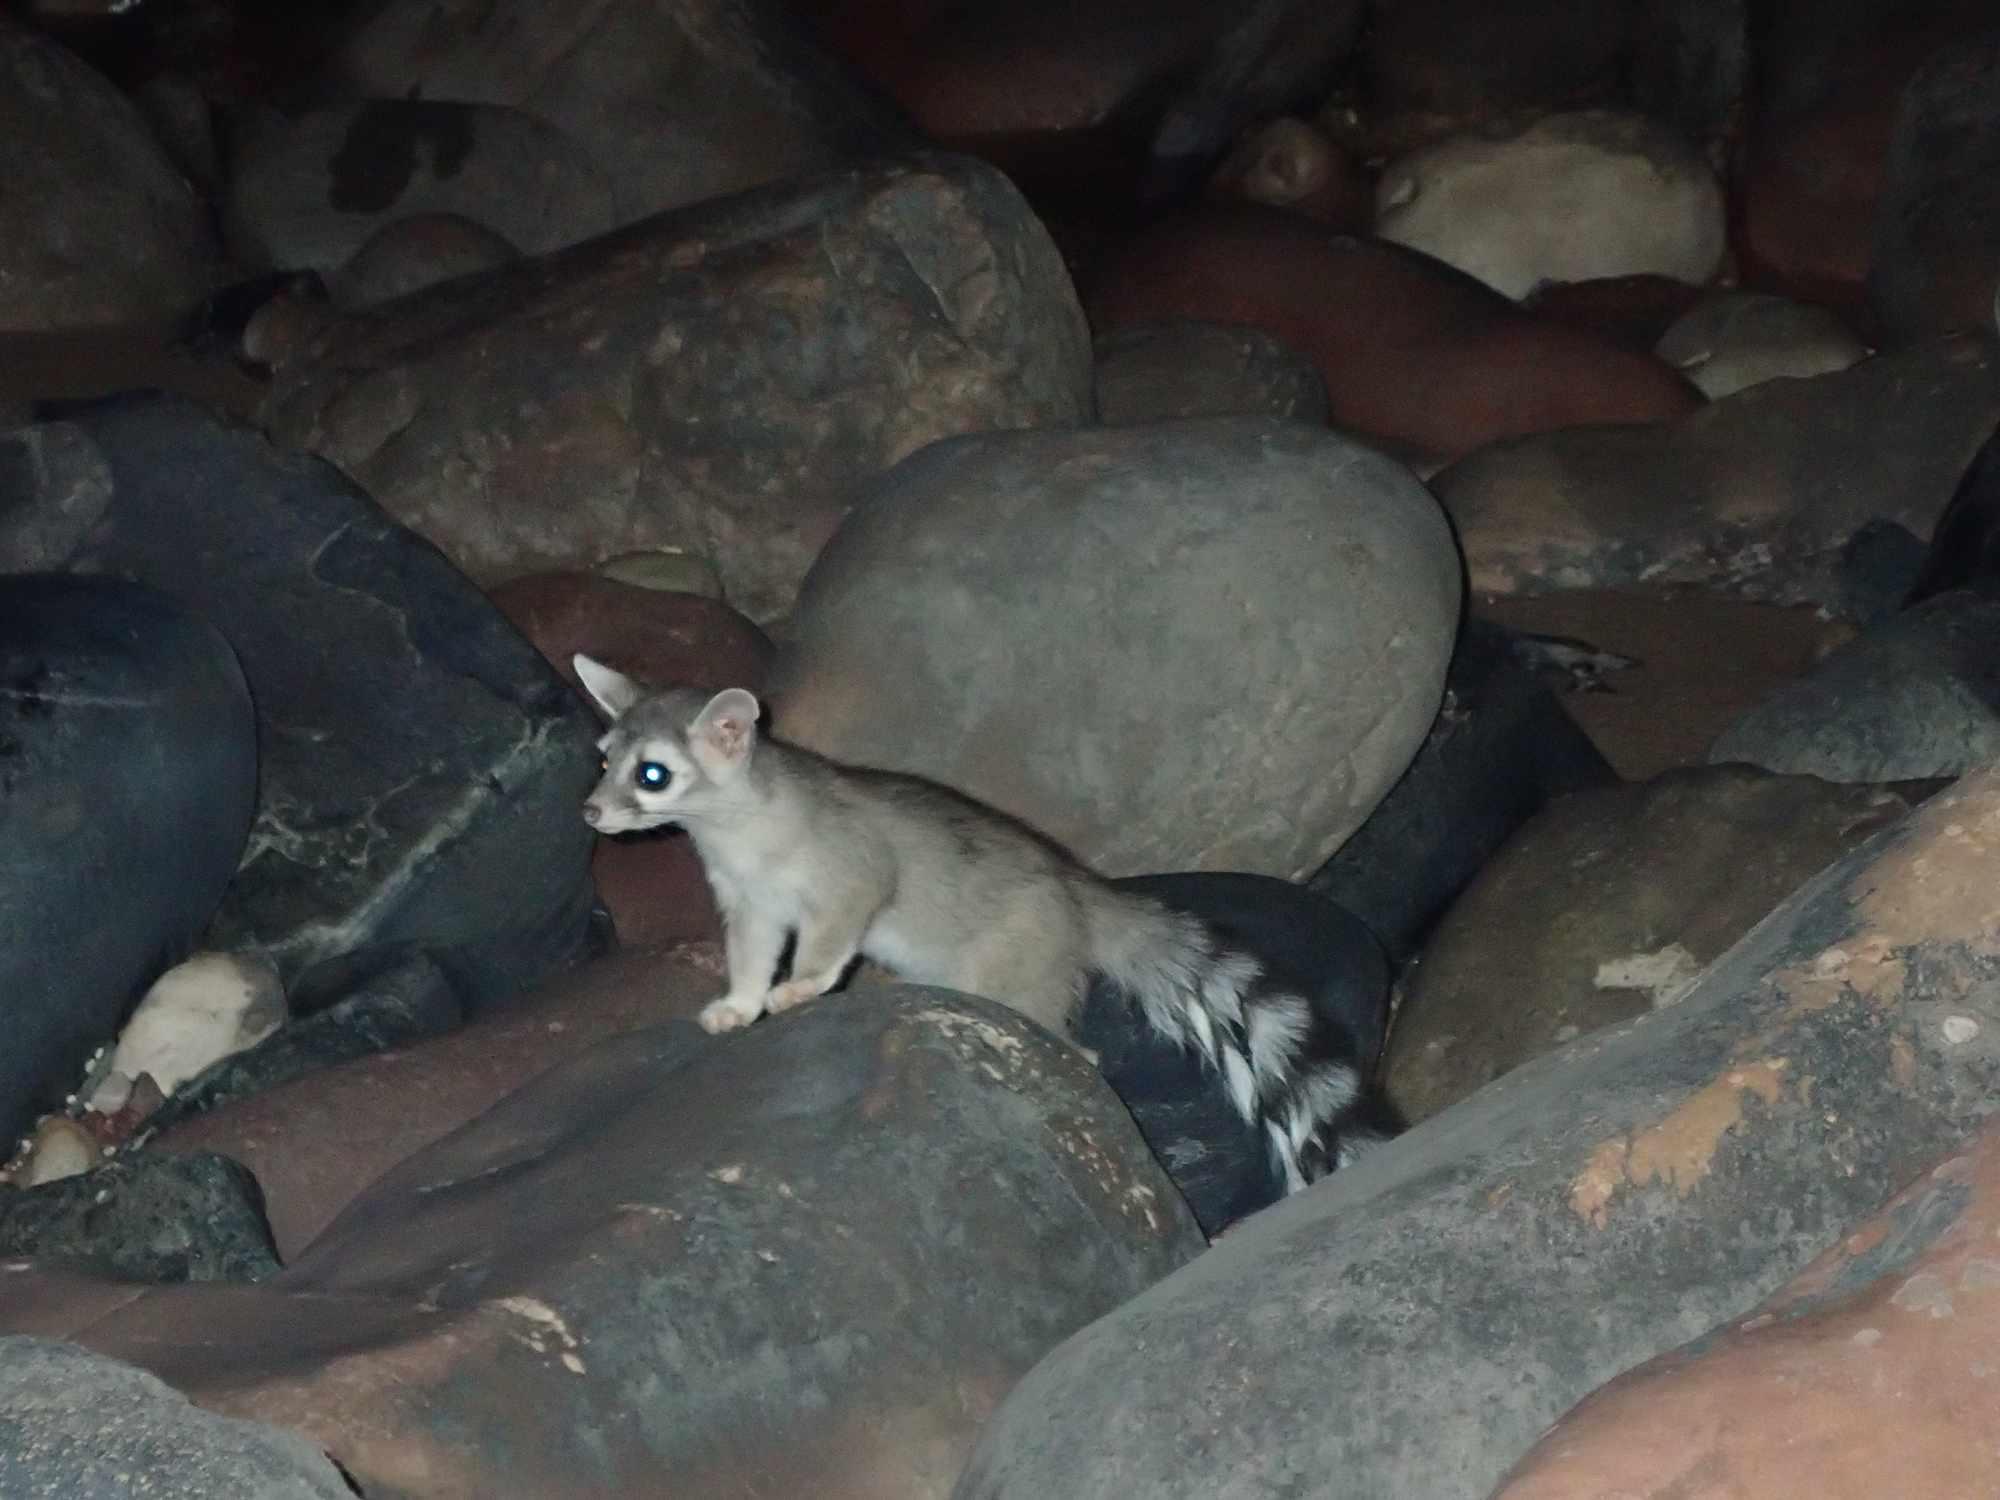 The elusive ringtail cat is Arizona's state animal